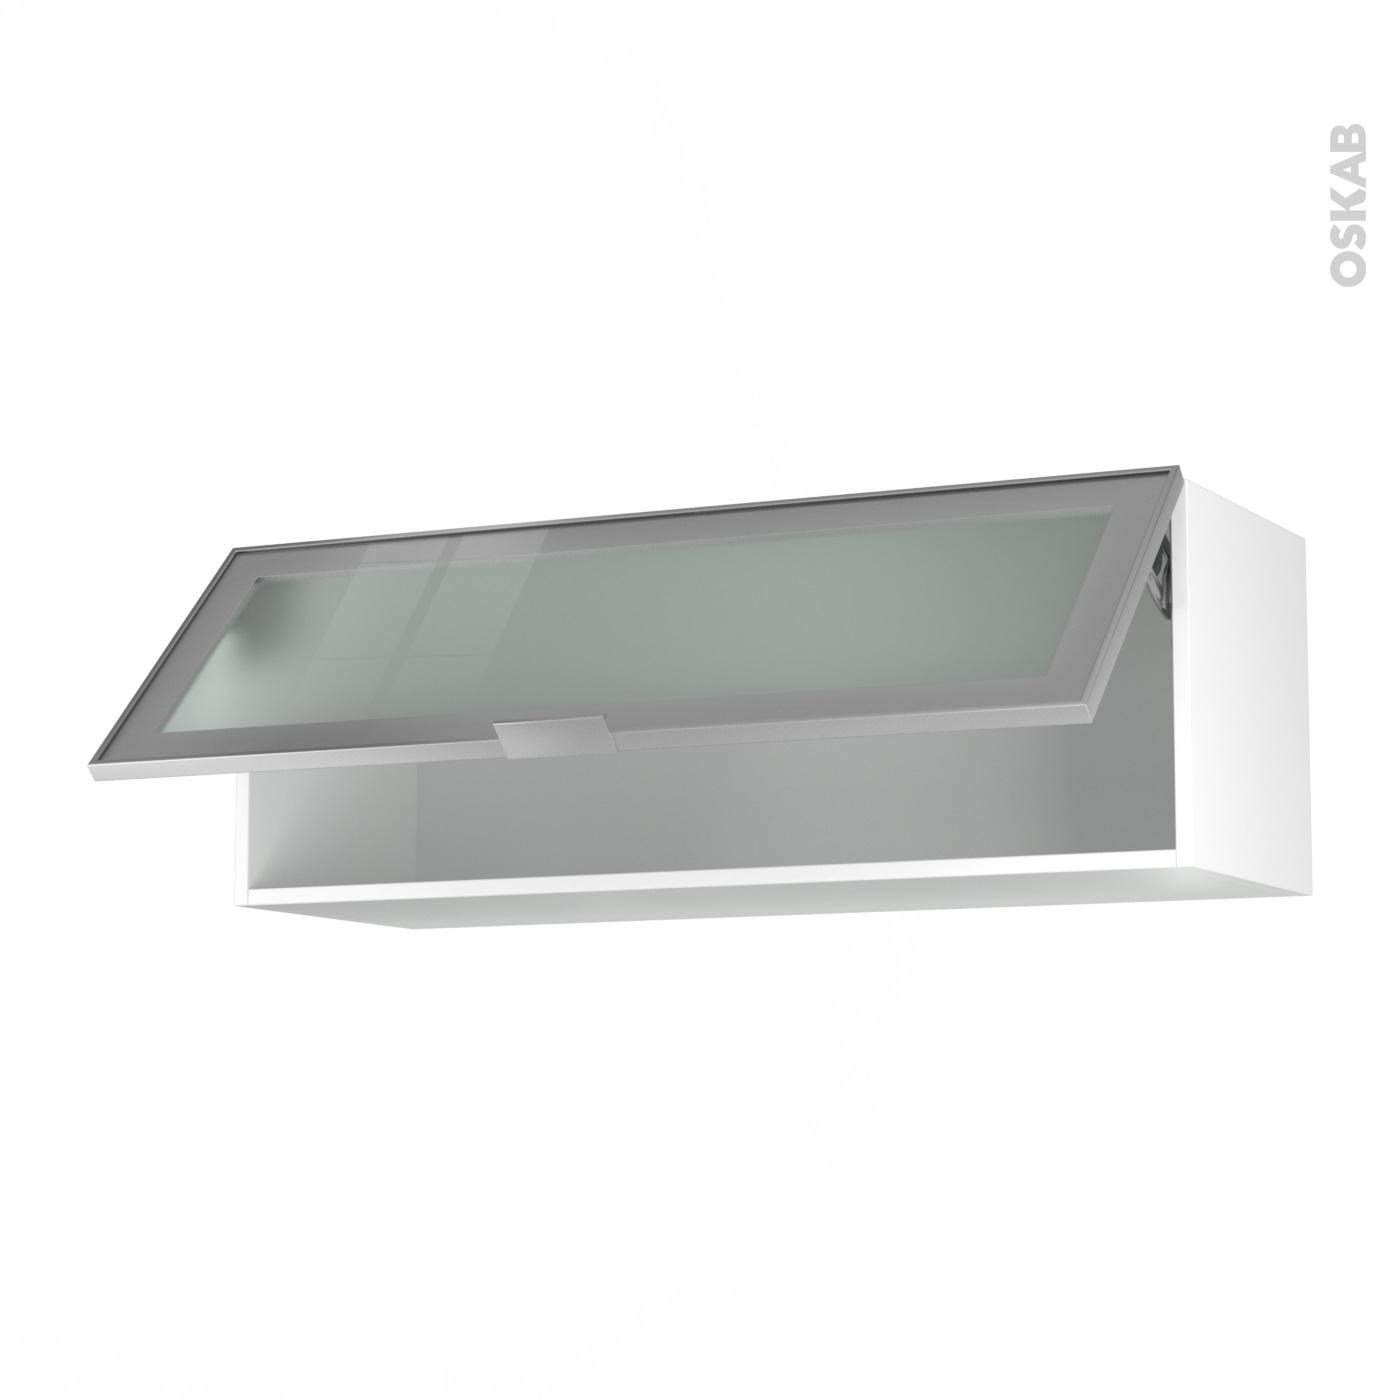 meuble haut cuisine vitré